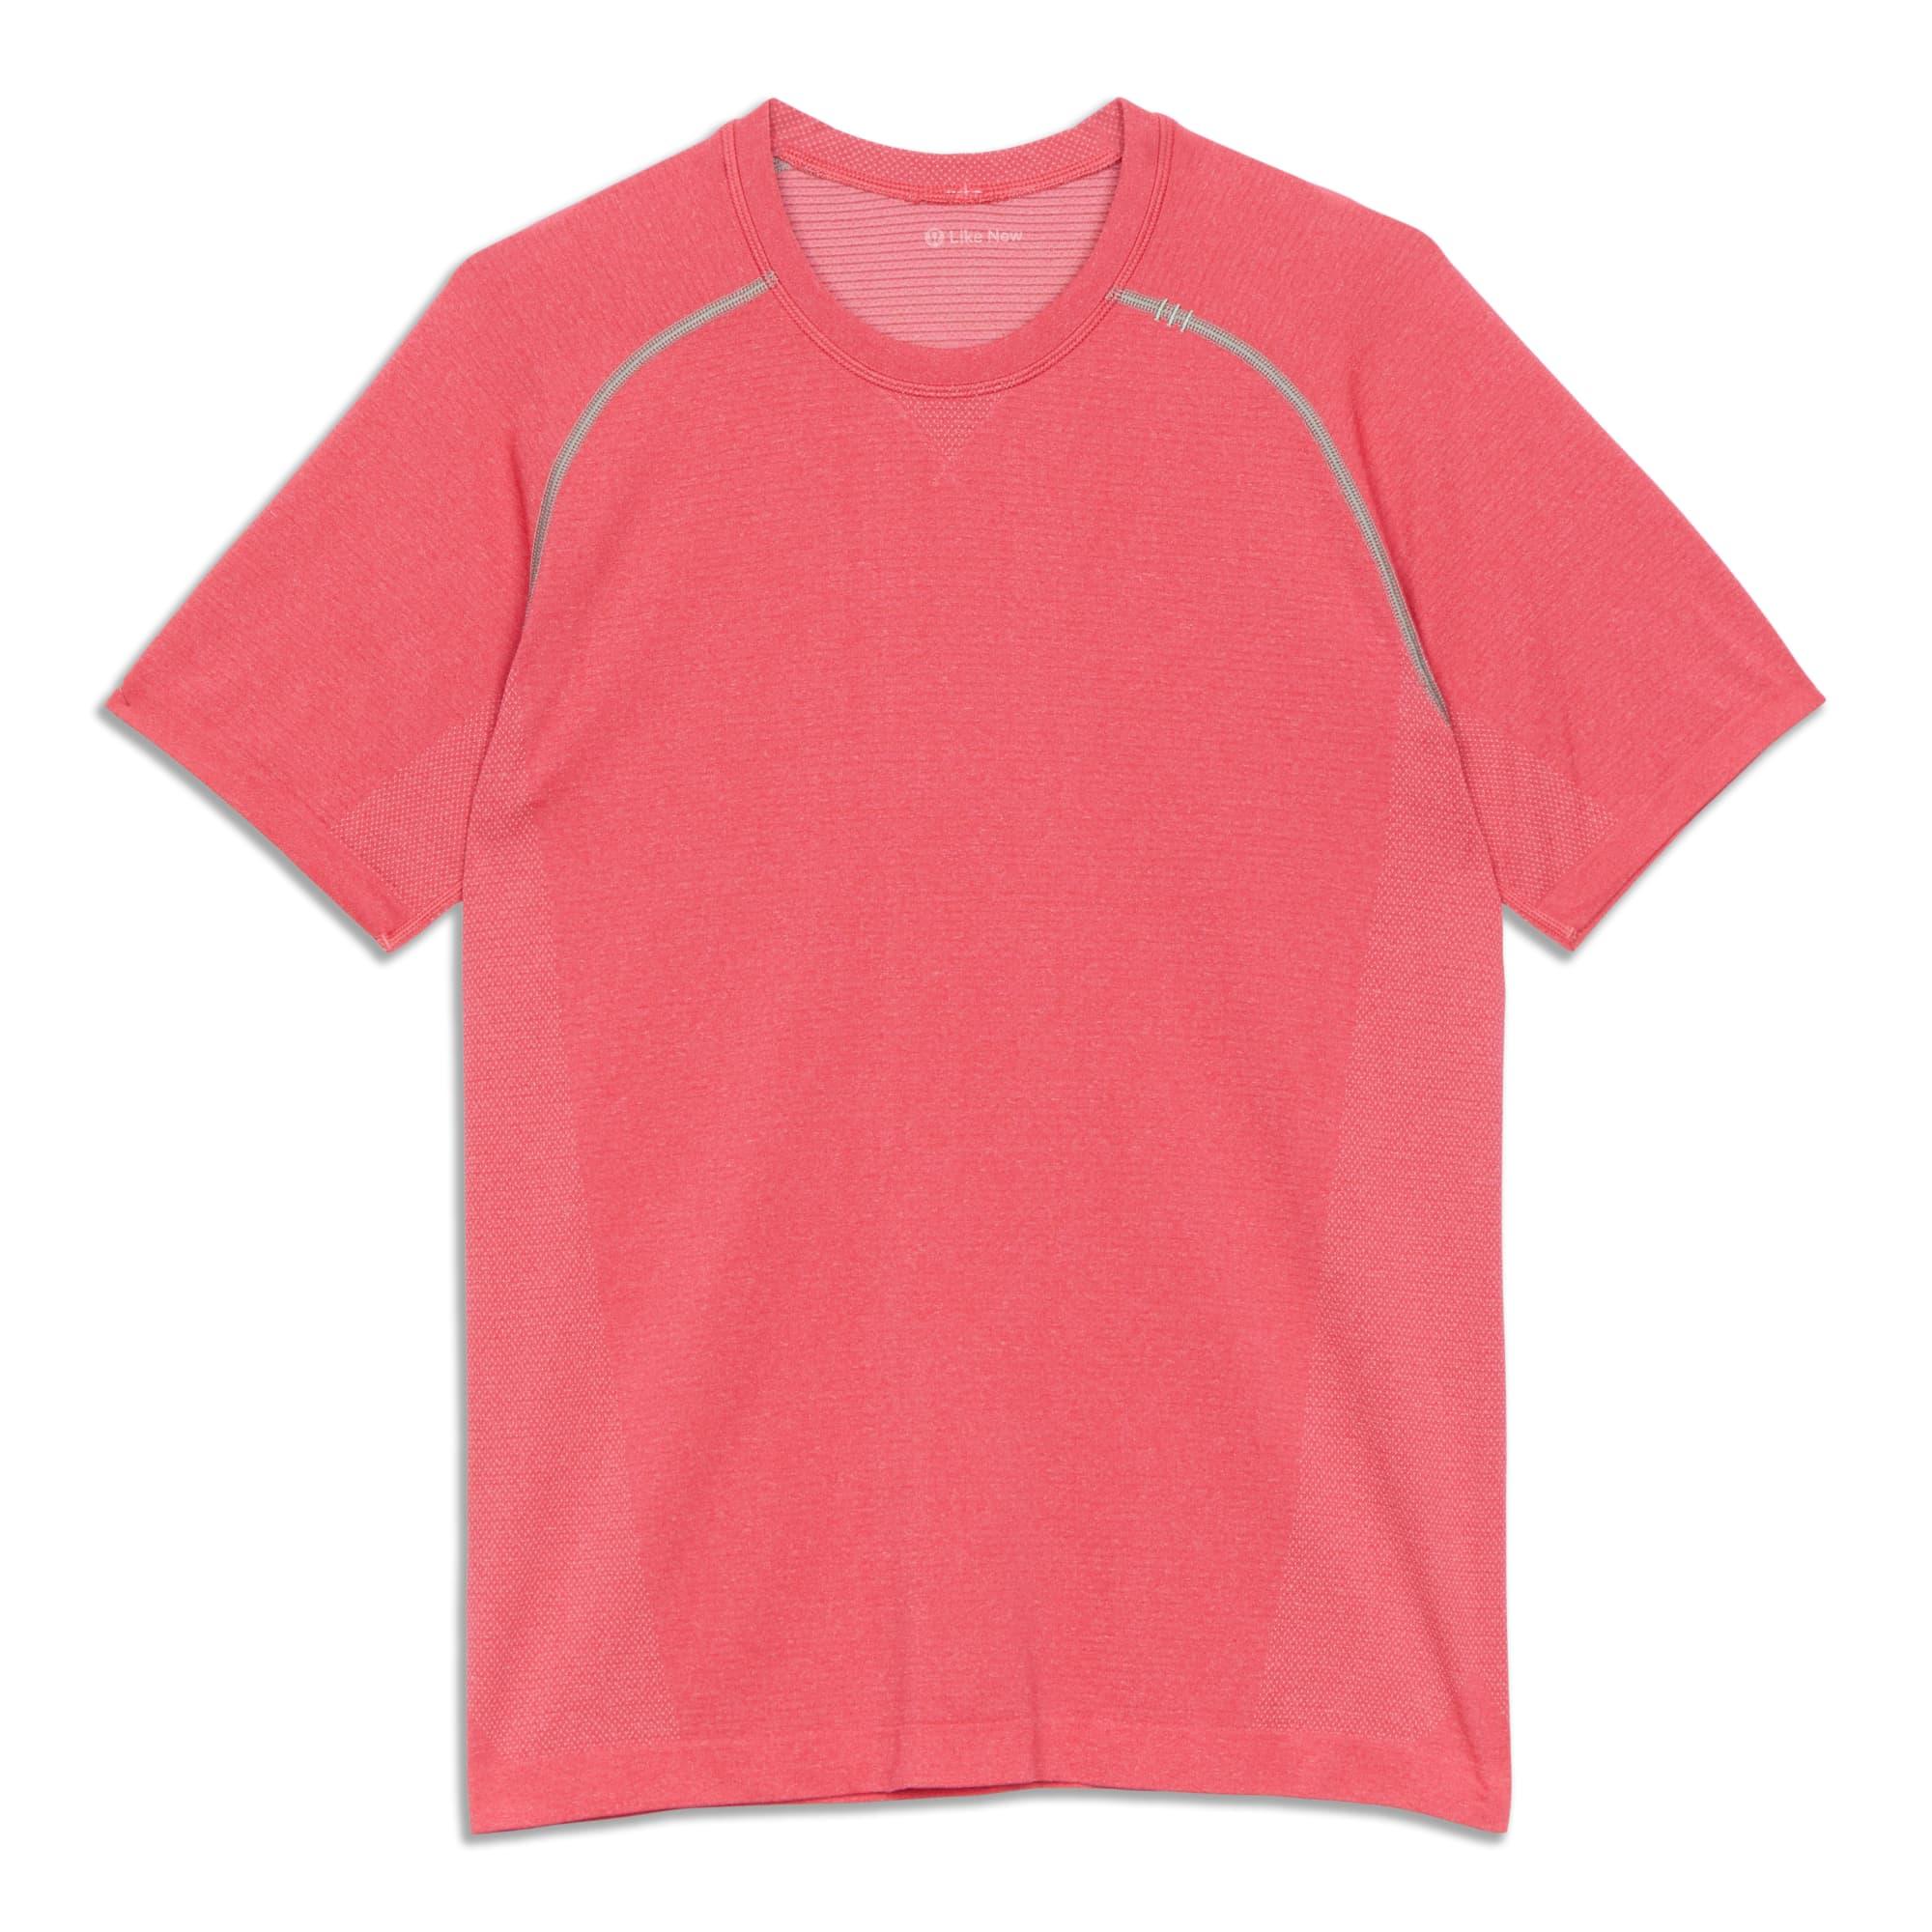 Main product image: Metal Vent Short Sleeve Shirt - Resale